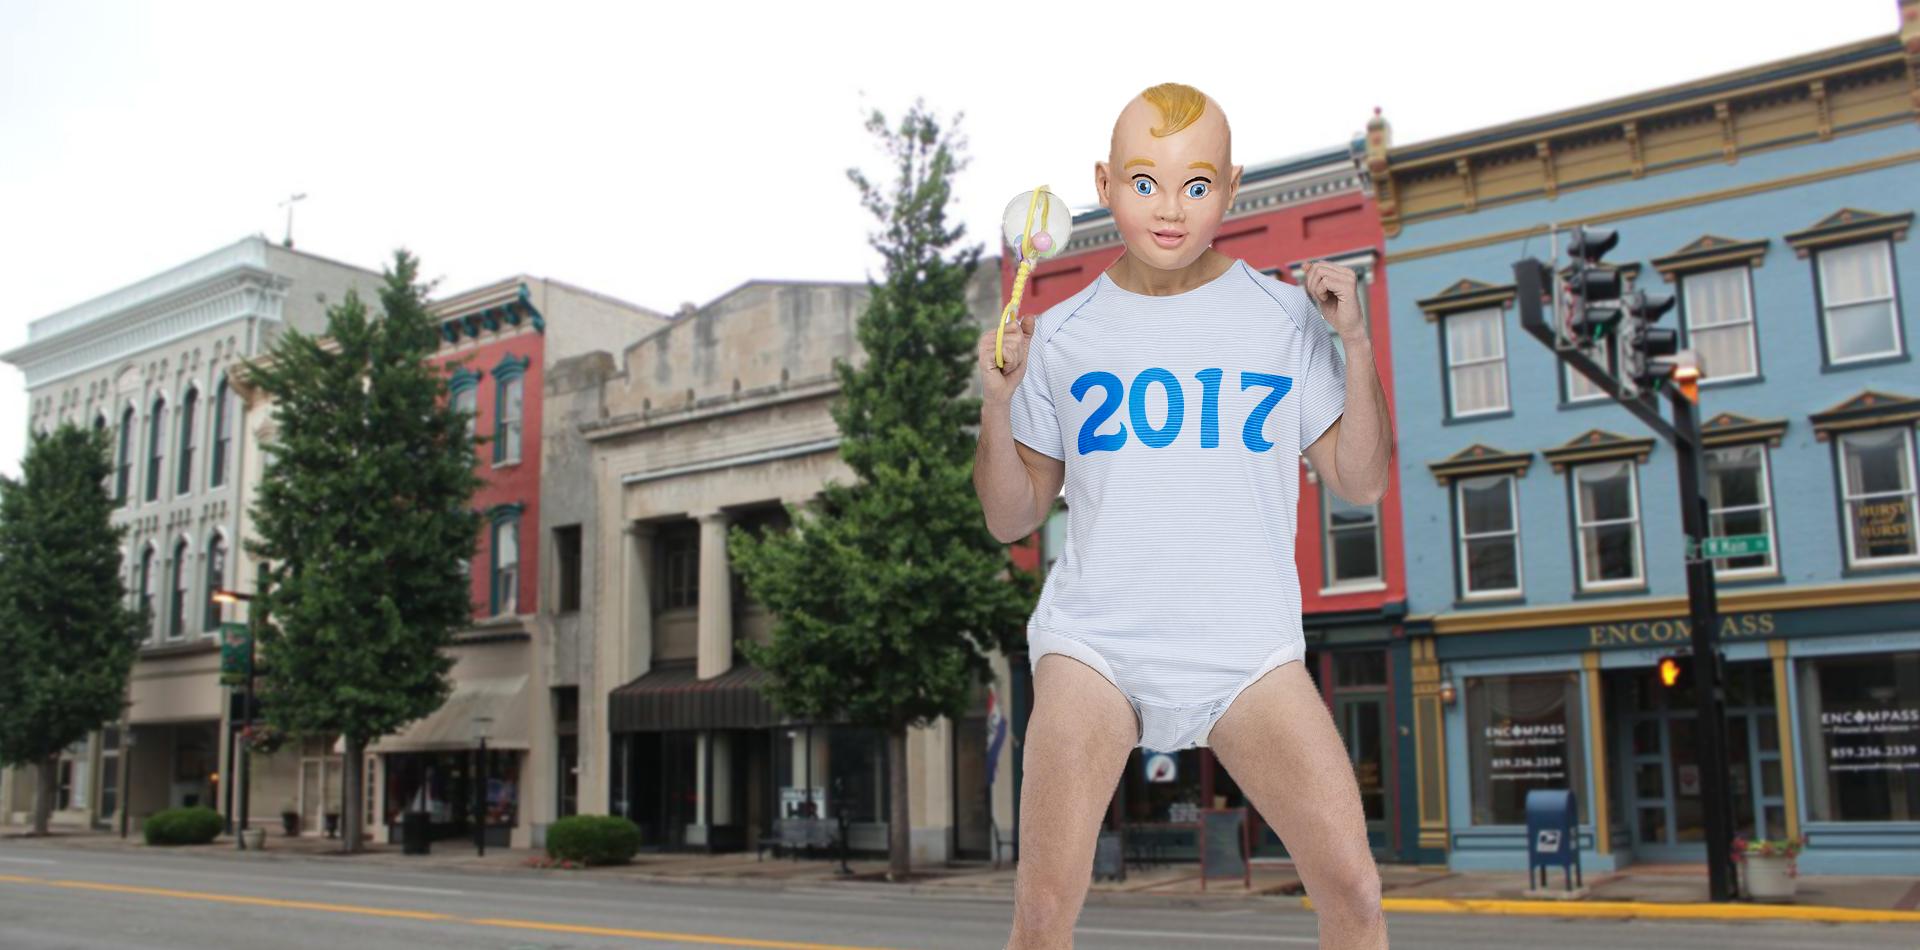 walk softly films, baby new year, 2017, indie film, podcast, talk hard